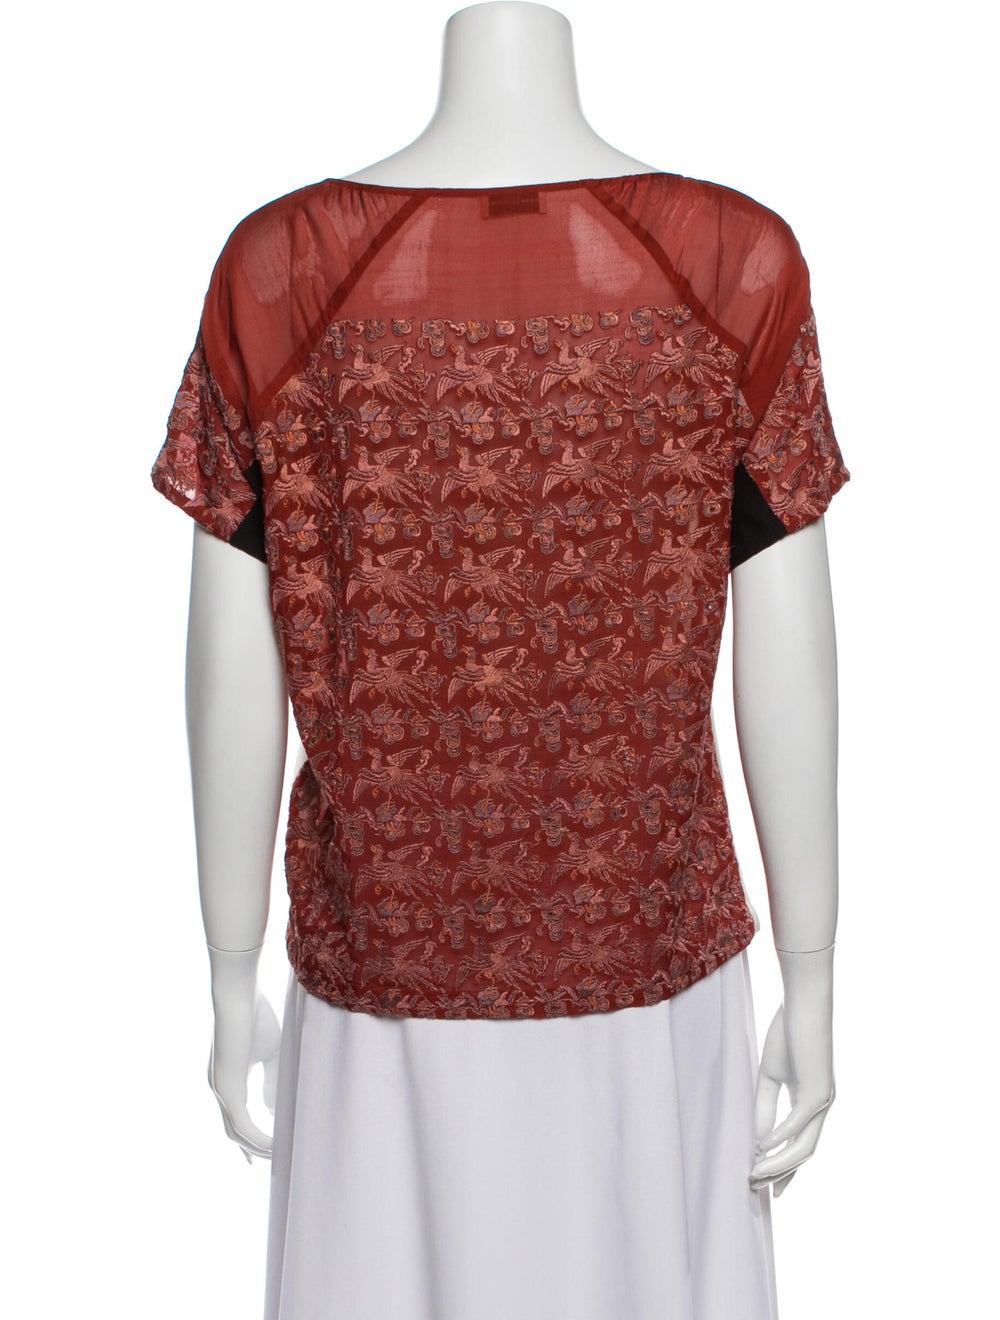 Dries Van Noten Silk Printed T-Shirt Red - image 3